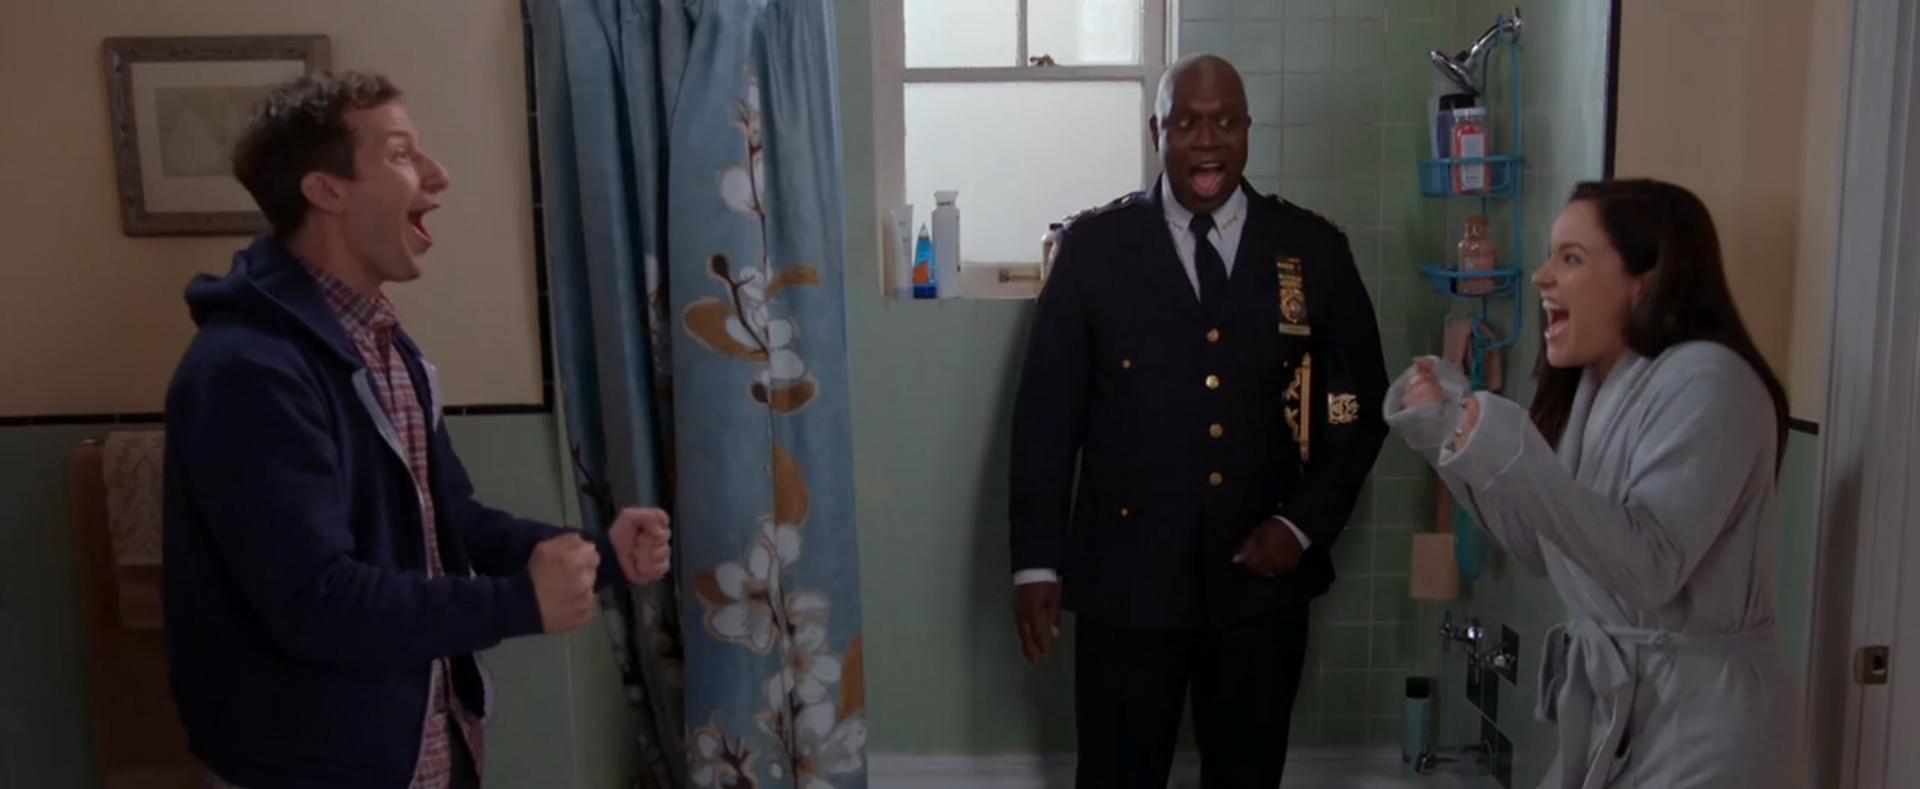 Brooklyn Nine-Nine: The Last Day. Image Credit: NBC Studios.